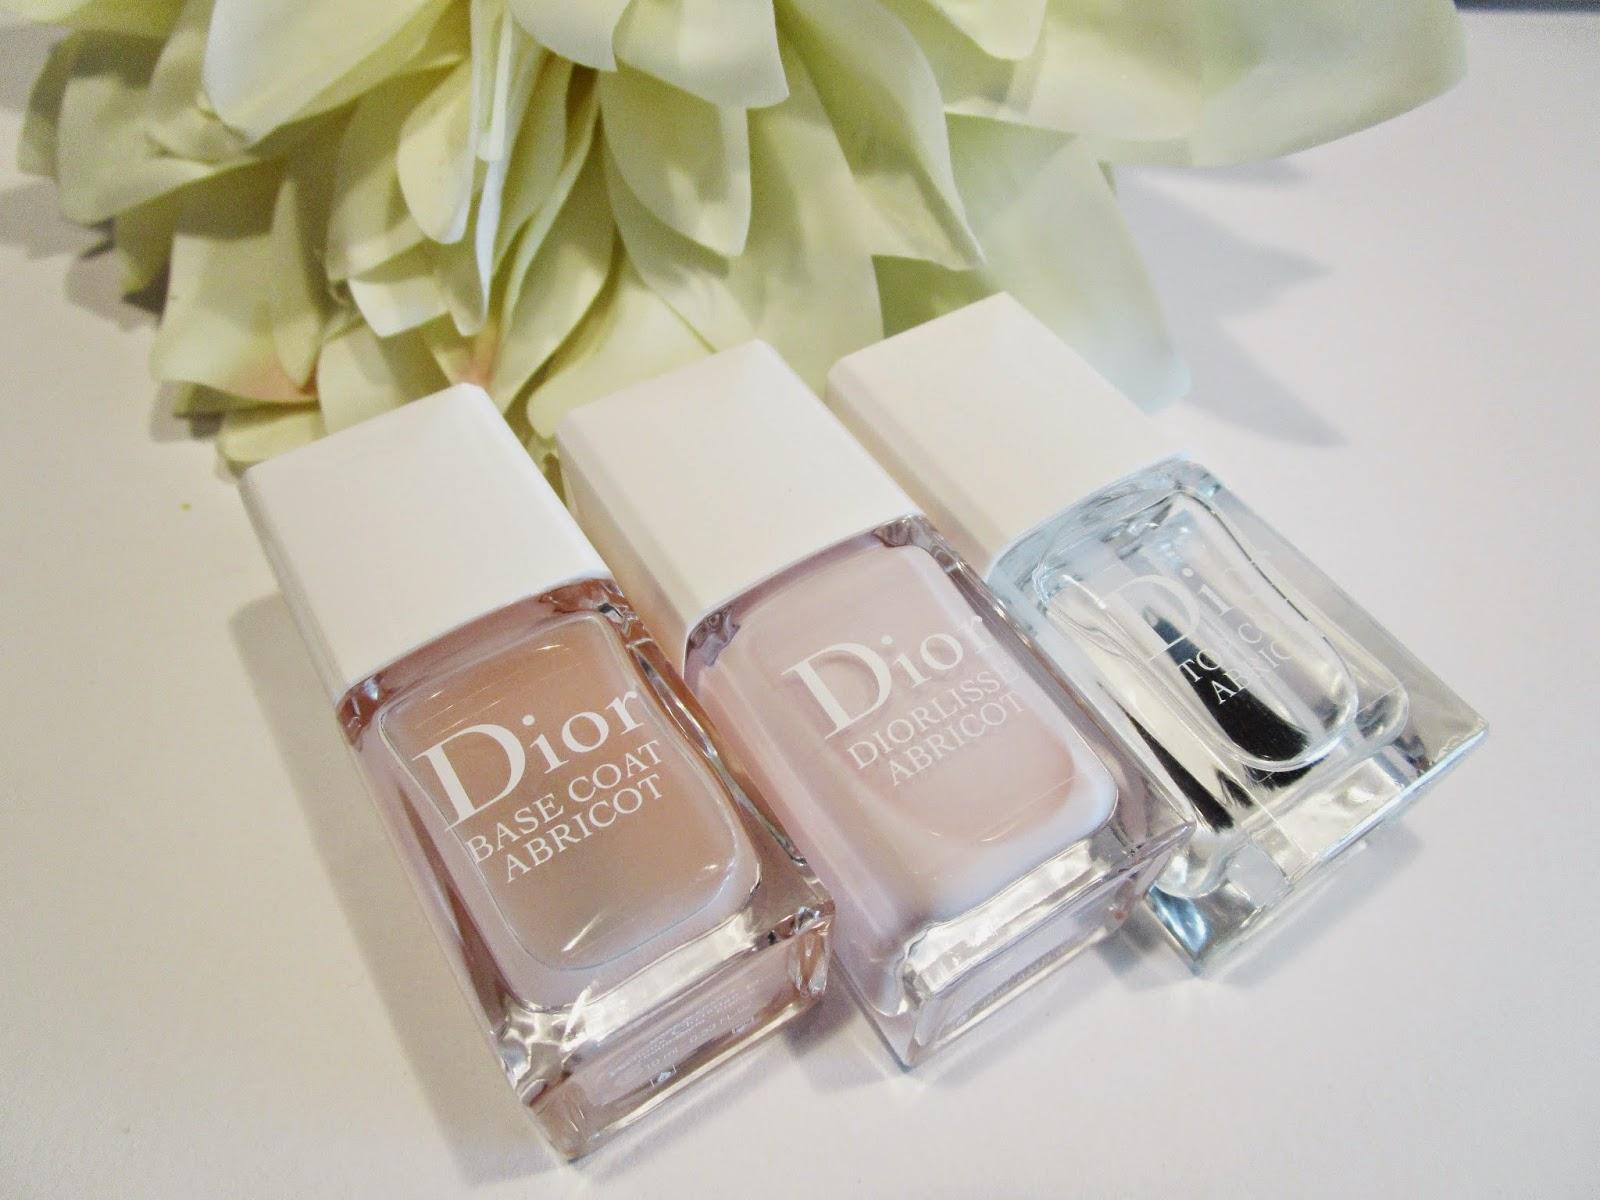 Base Coat Abricot, Laca de uñas Diorlisse Abricot y el Top Coat Abricot de Christian Dior